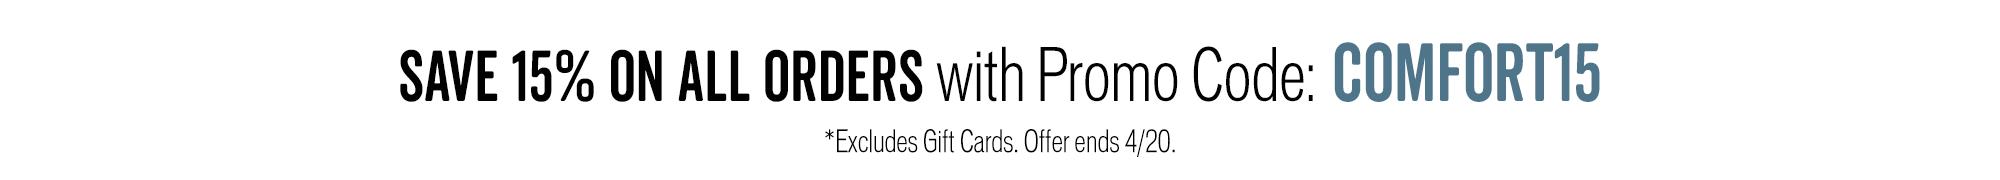 Promo Code Offering